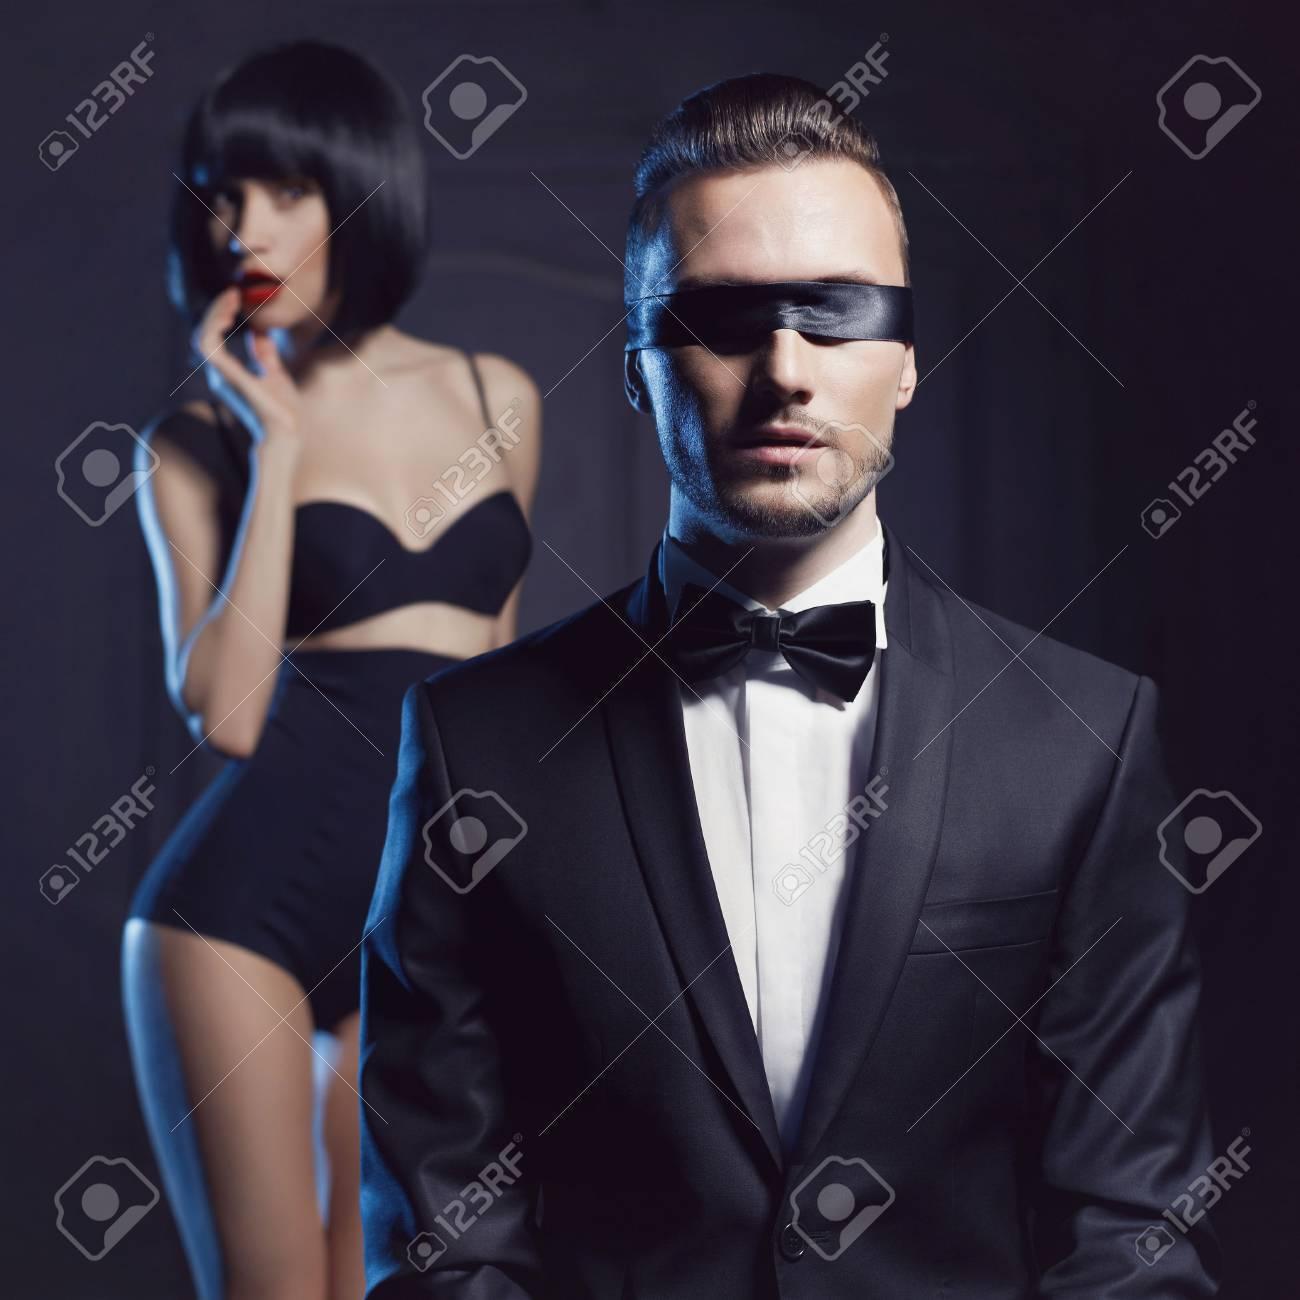 Fashion studio photo of a sensual couple in lingerie and a tuxedo Standard-Bild - 36893801